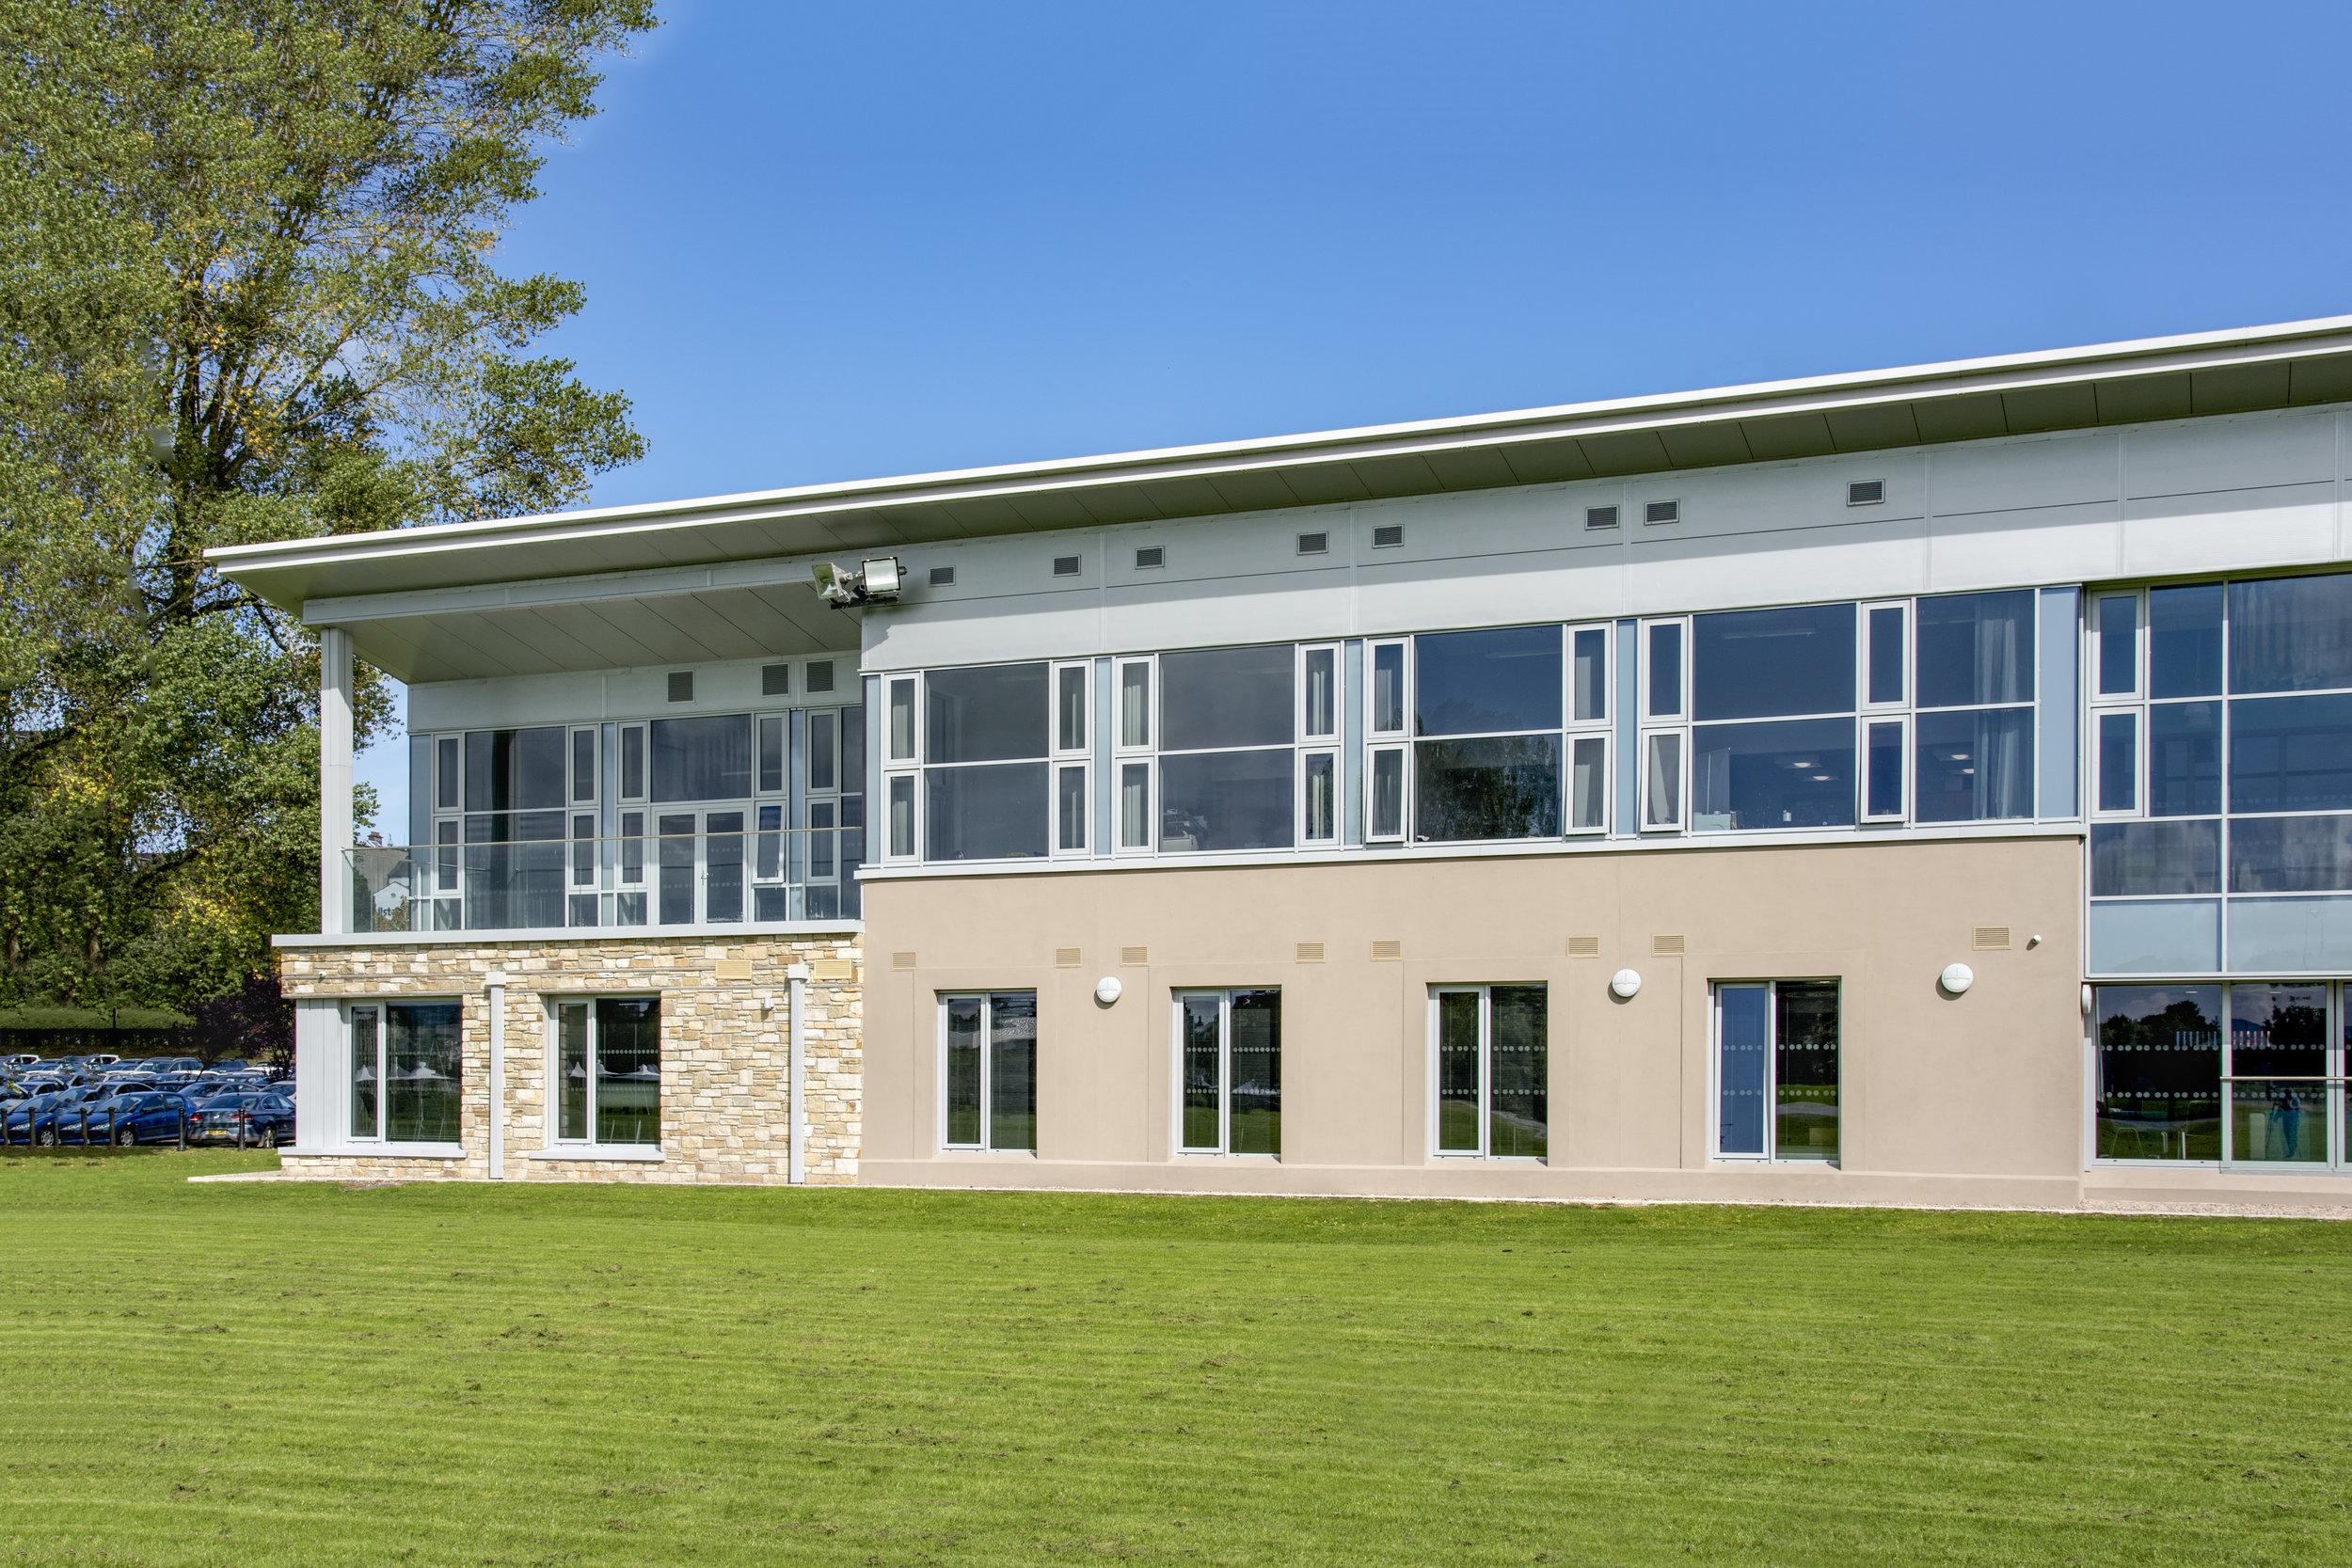 Paul_McAlister_Architects_Fermanagh-House.jpg